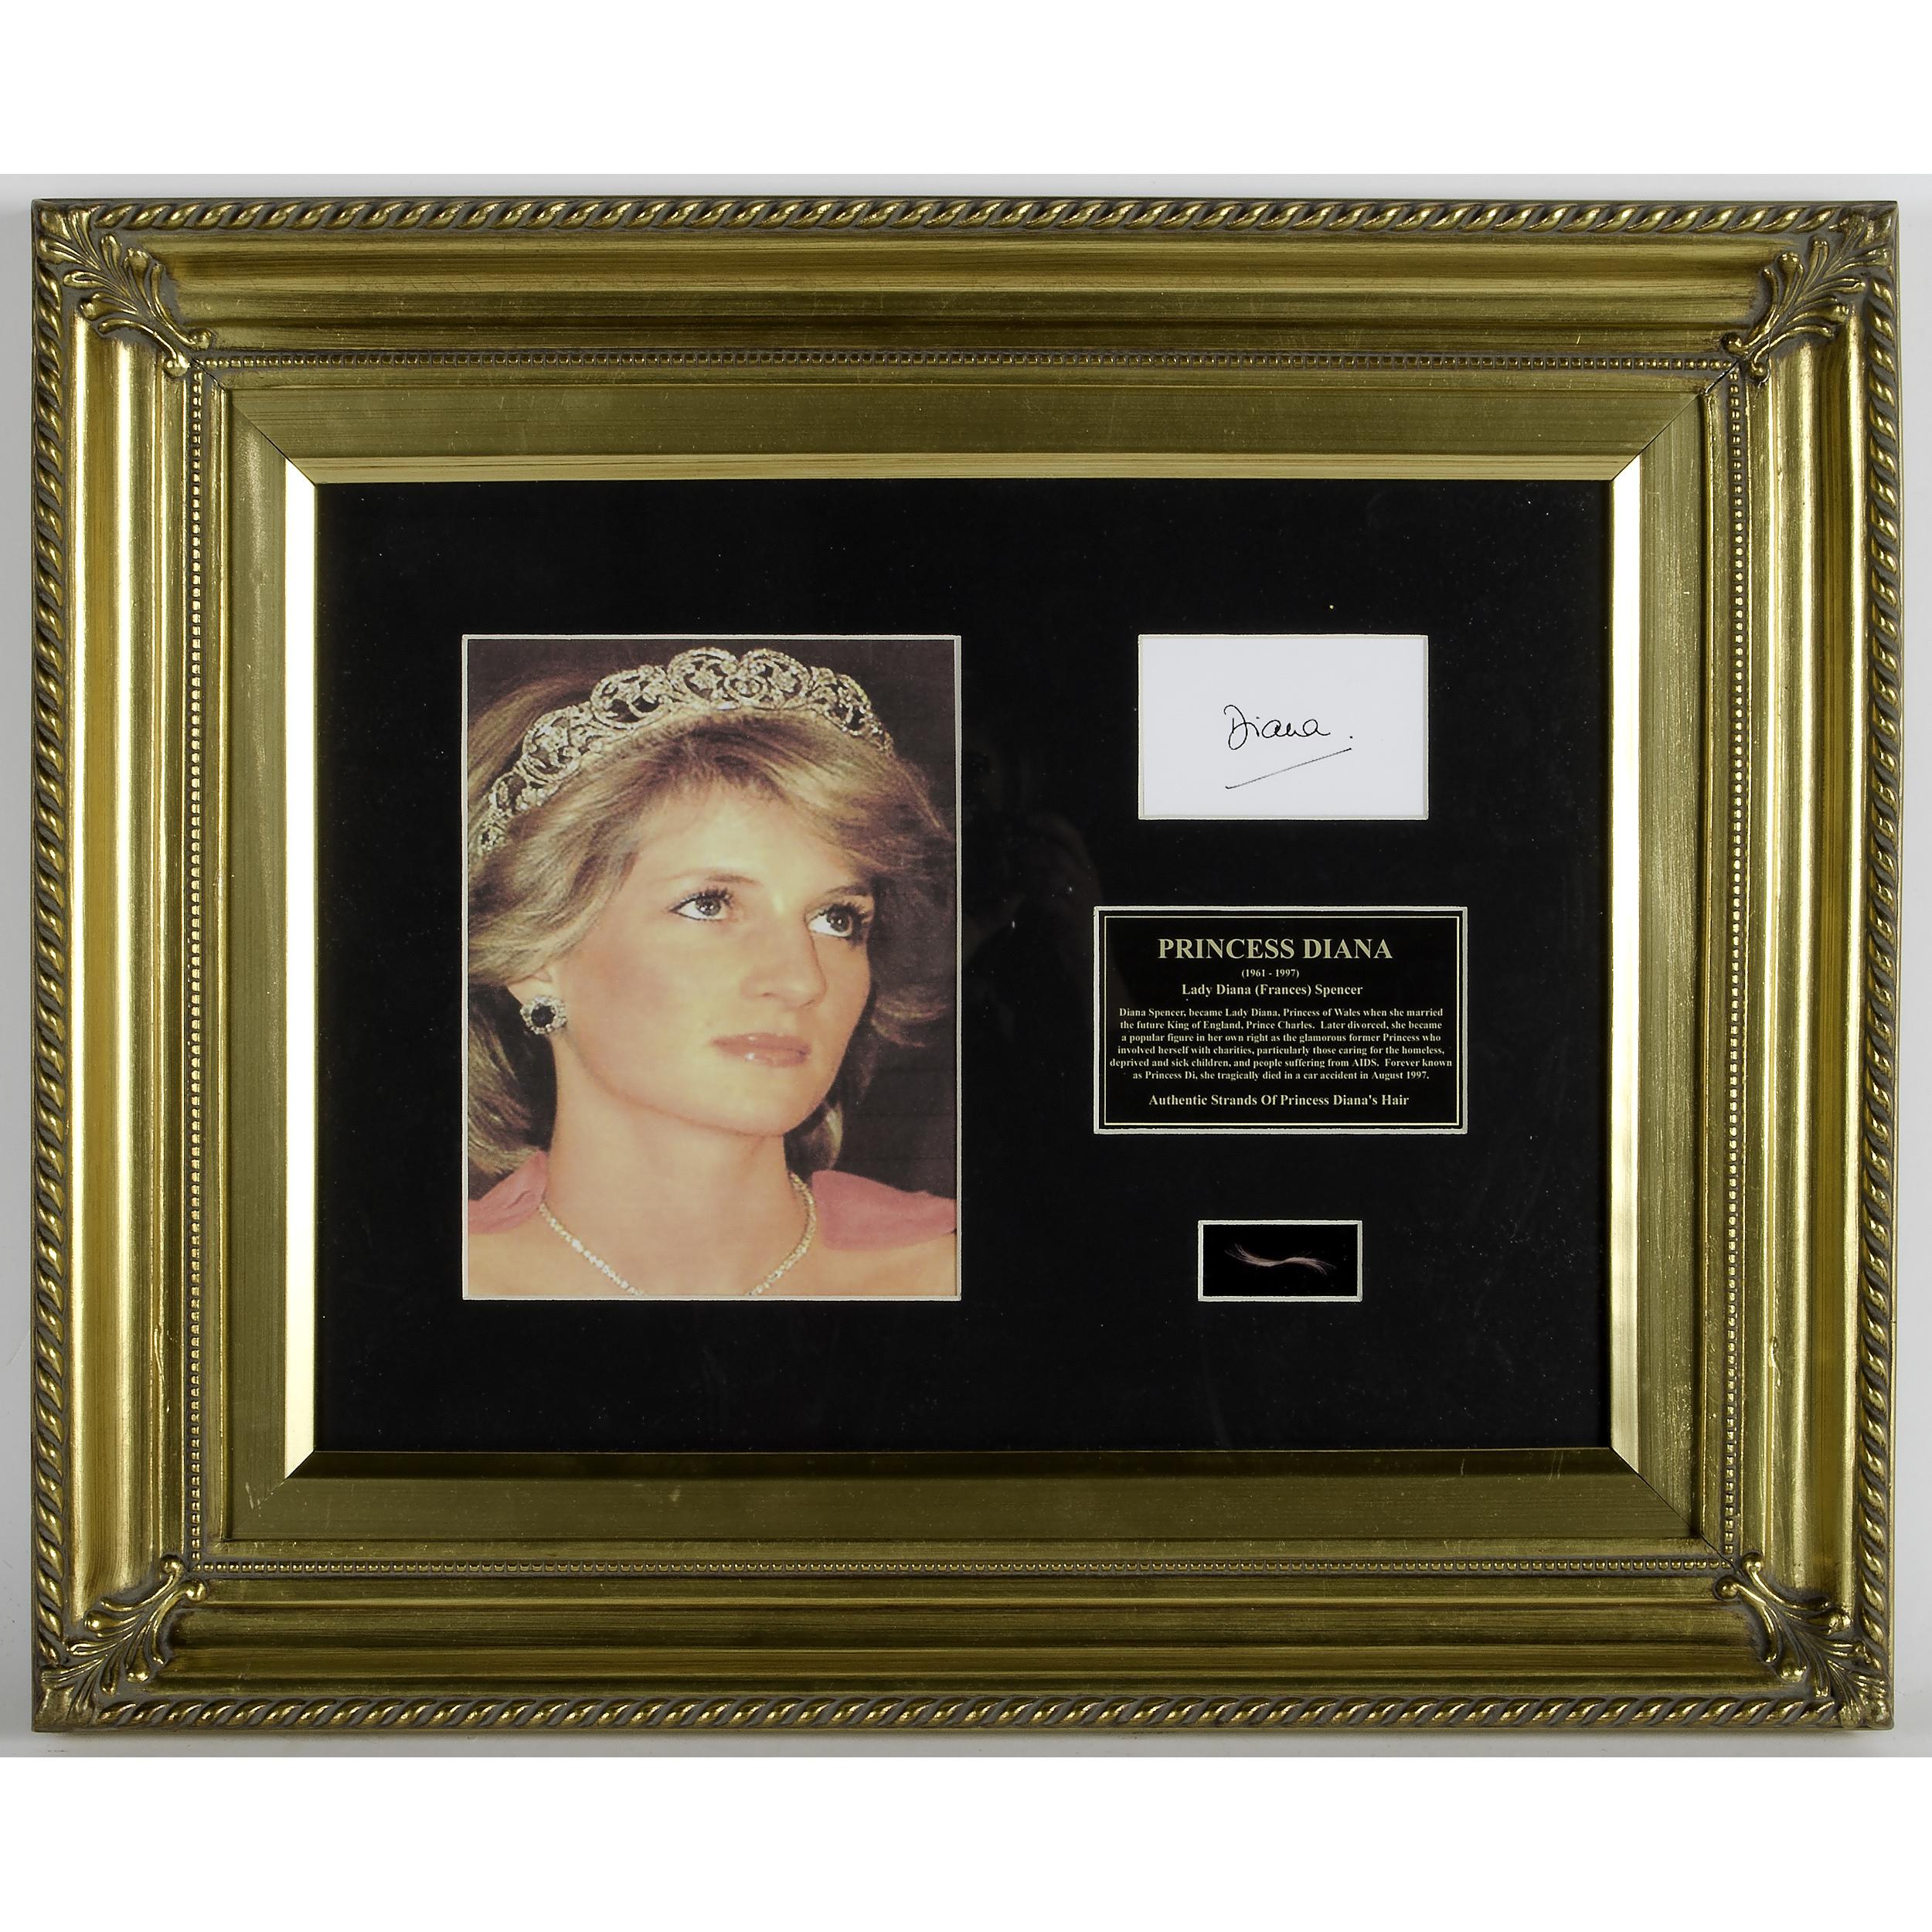 Princess Diana Lock of Hair | Cowan's Auction House: The